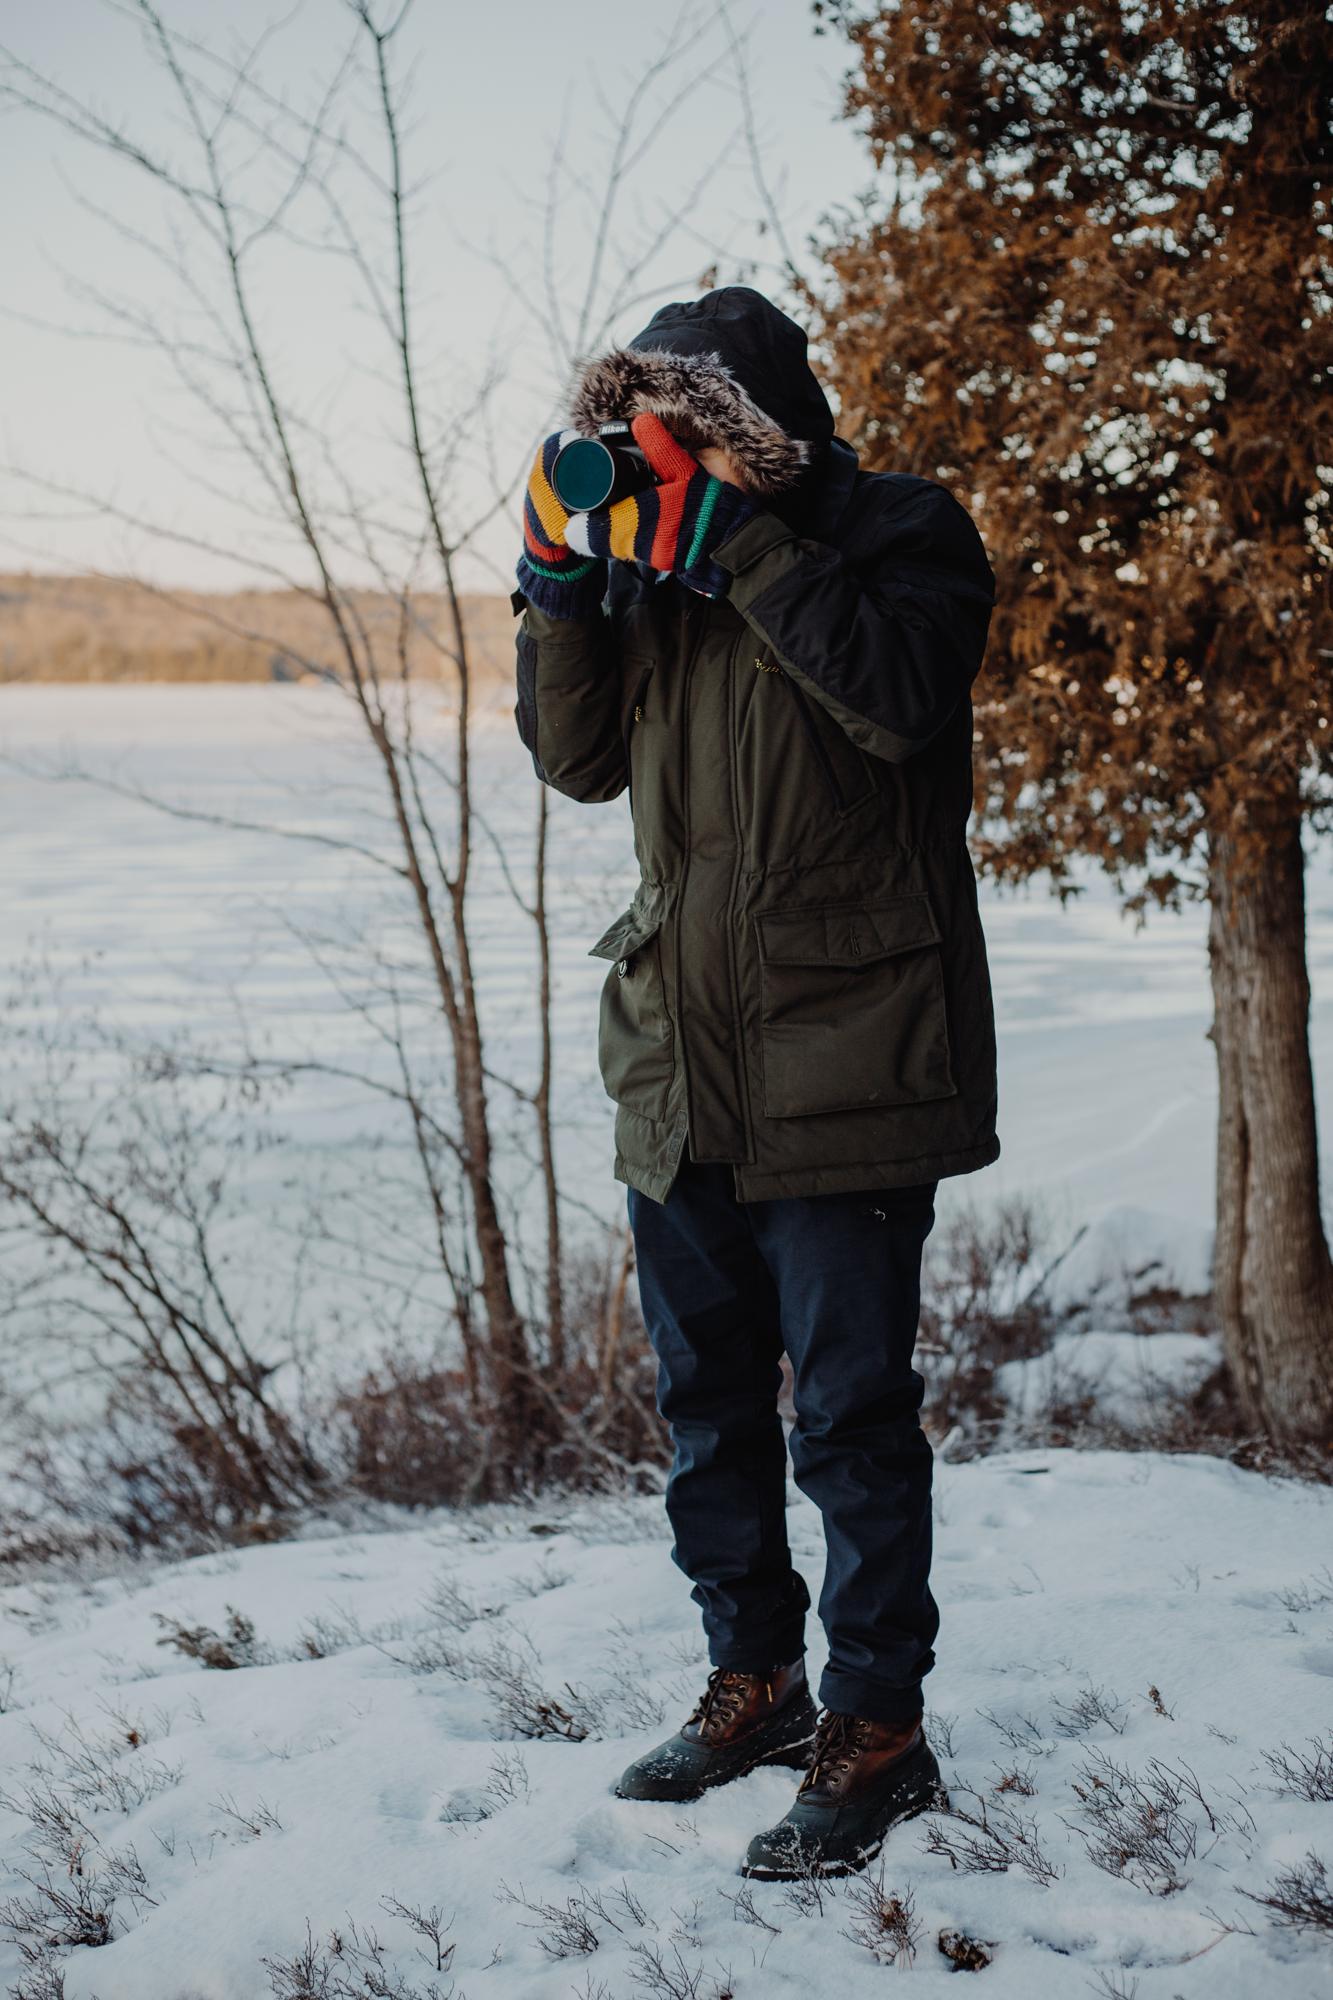 Get a Photography Internship